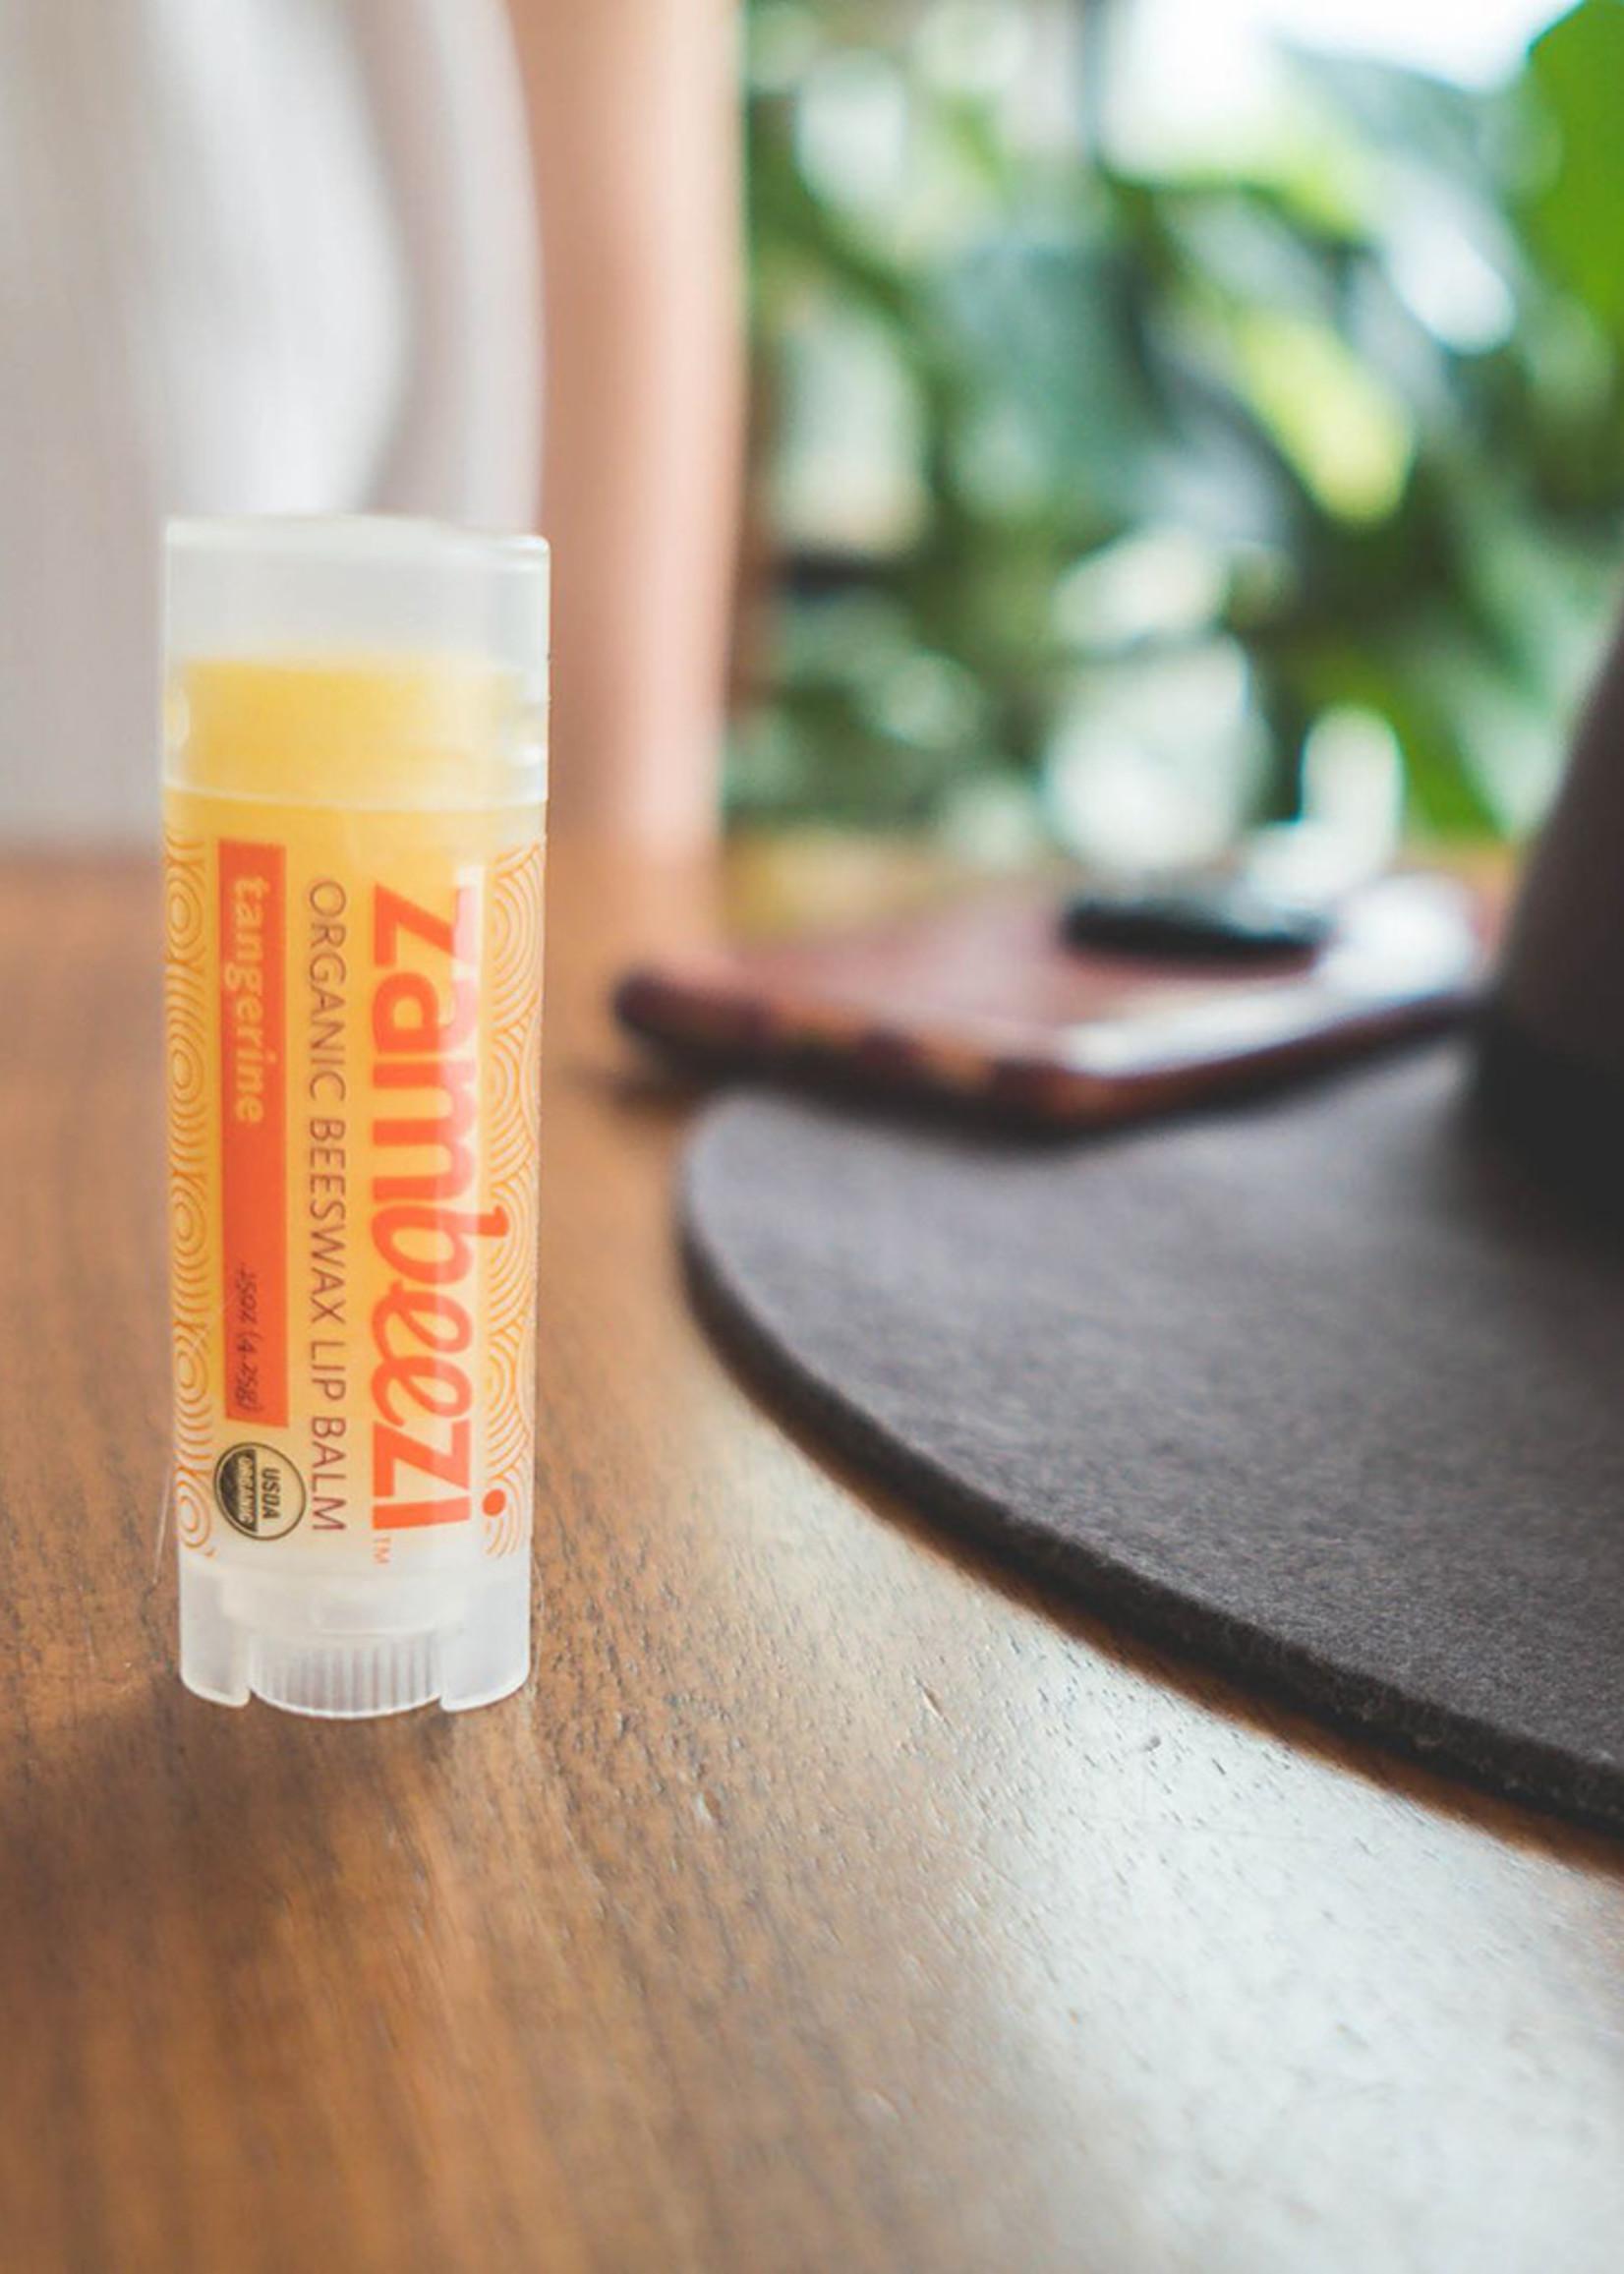 Tangerine Beeswax Lip Balm